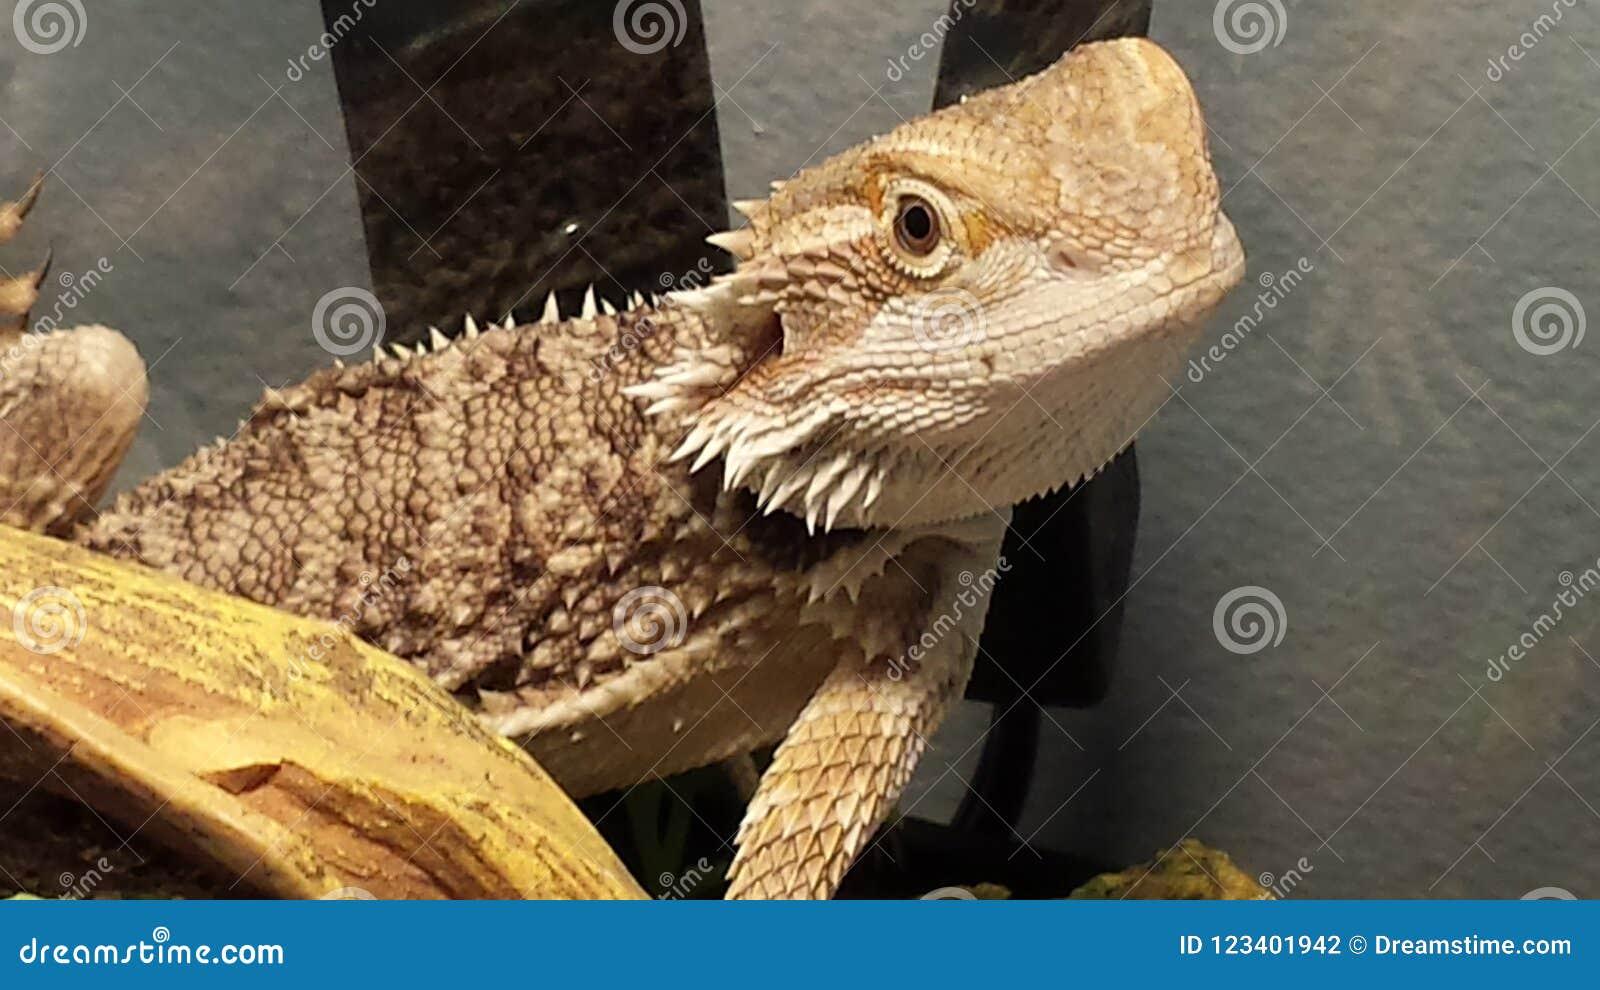 My Beautiful Bearded Dragon Zarrah Stock Photo - Image of